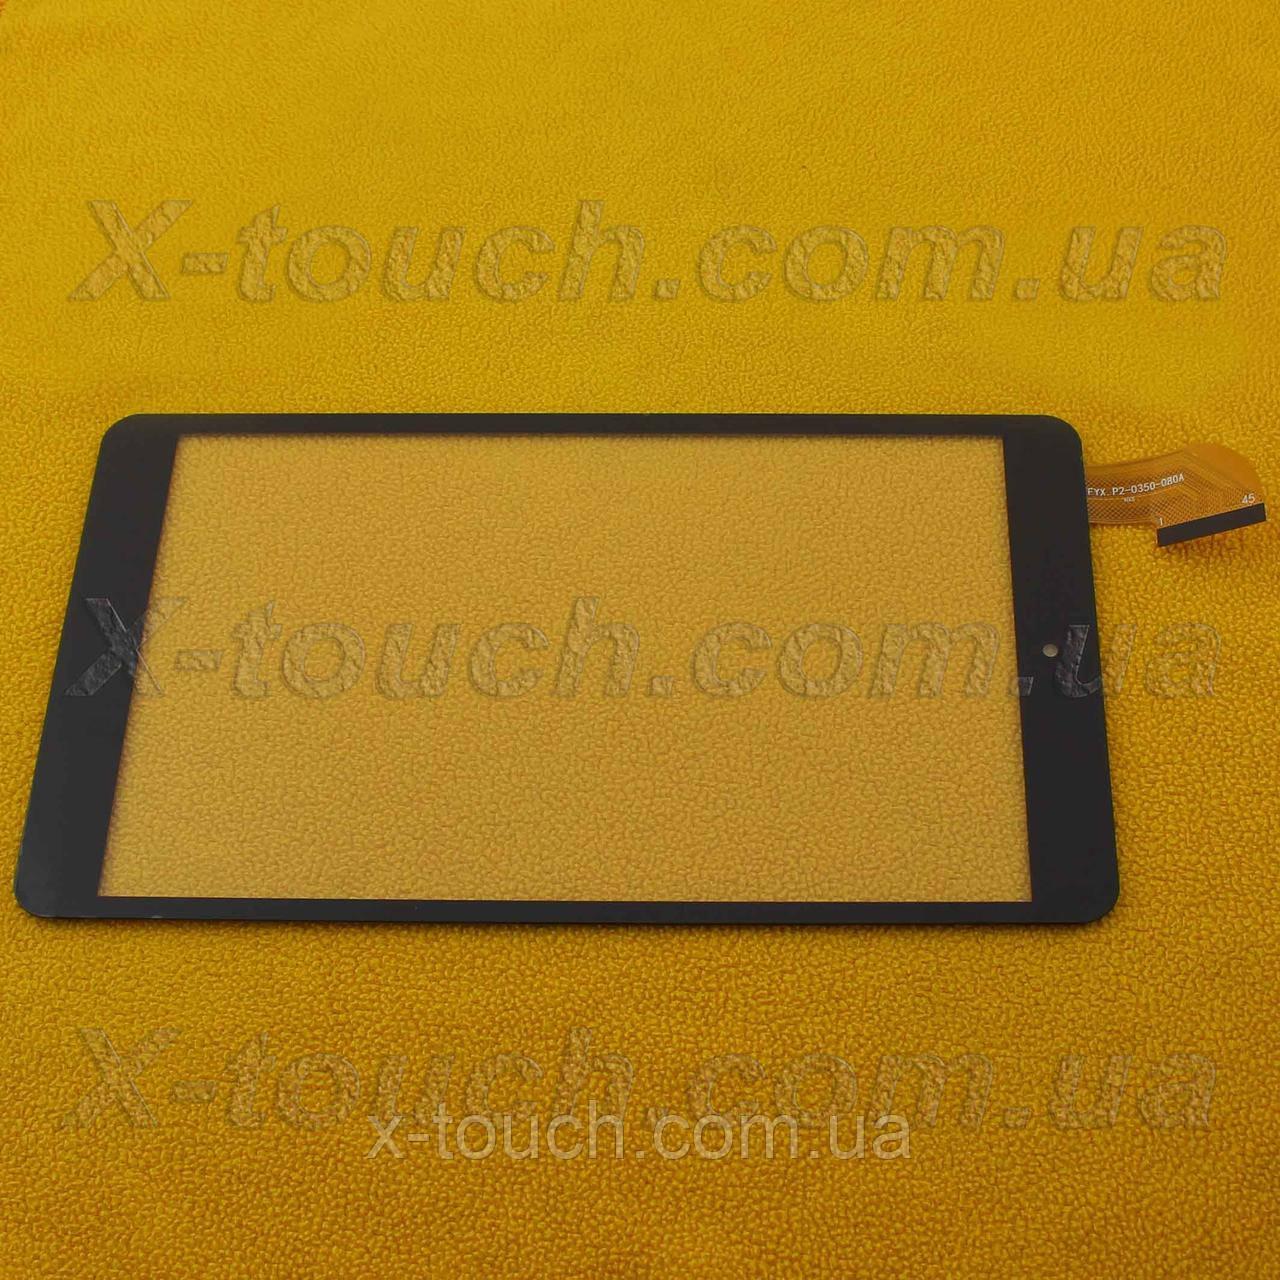 Тачскрин, сенсор DXP2-0350-080A для планшета